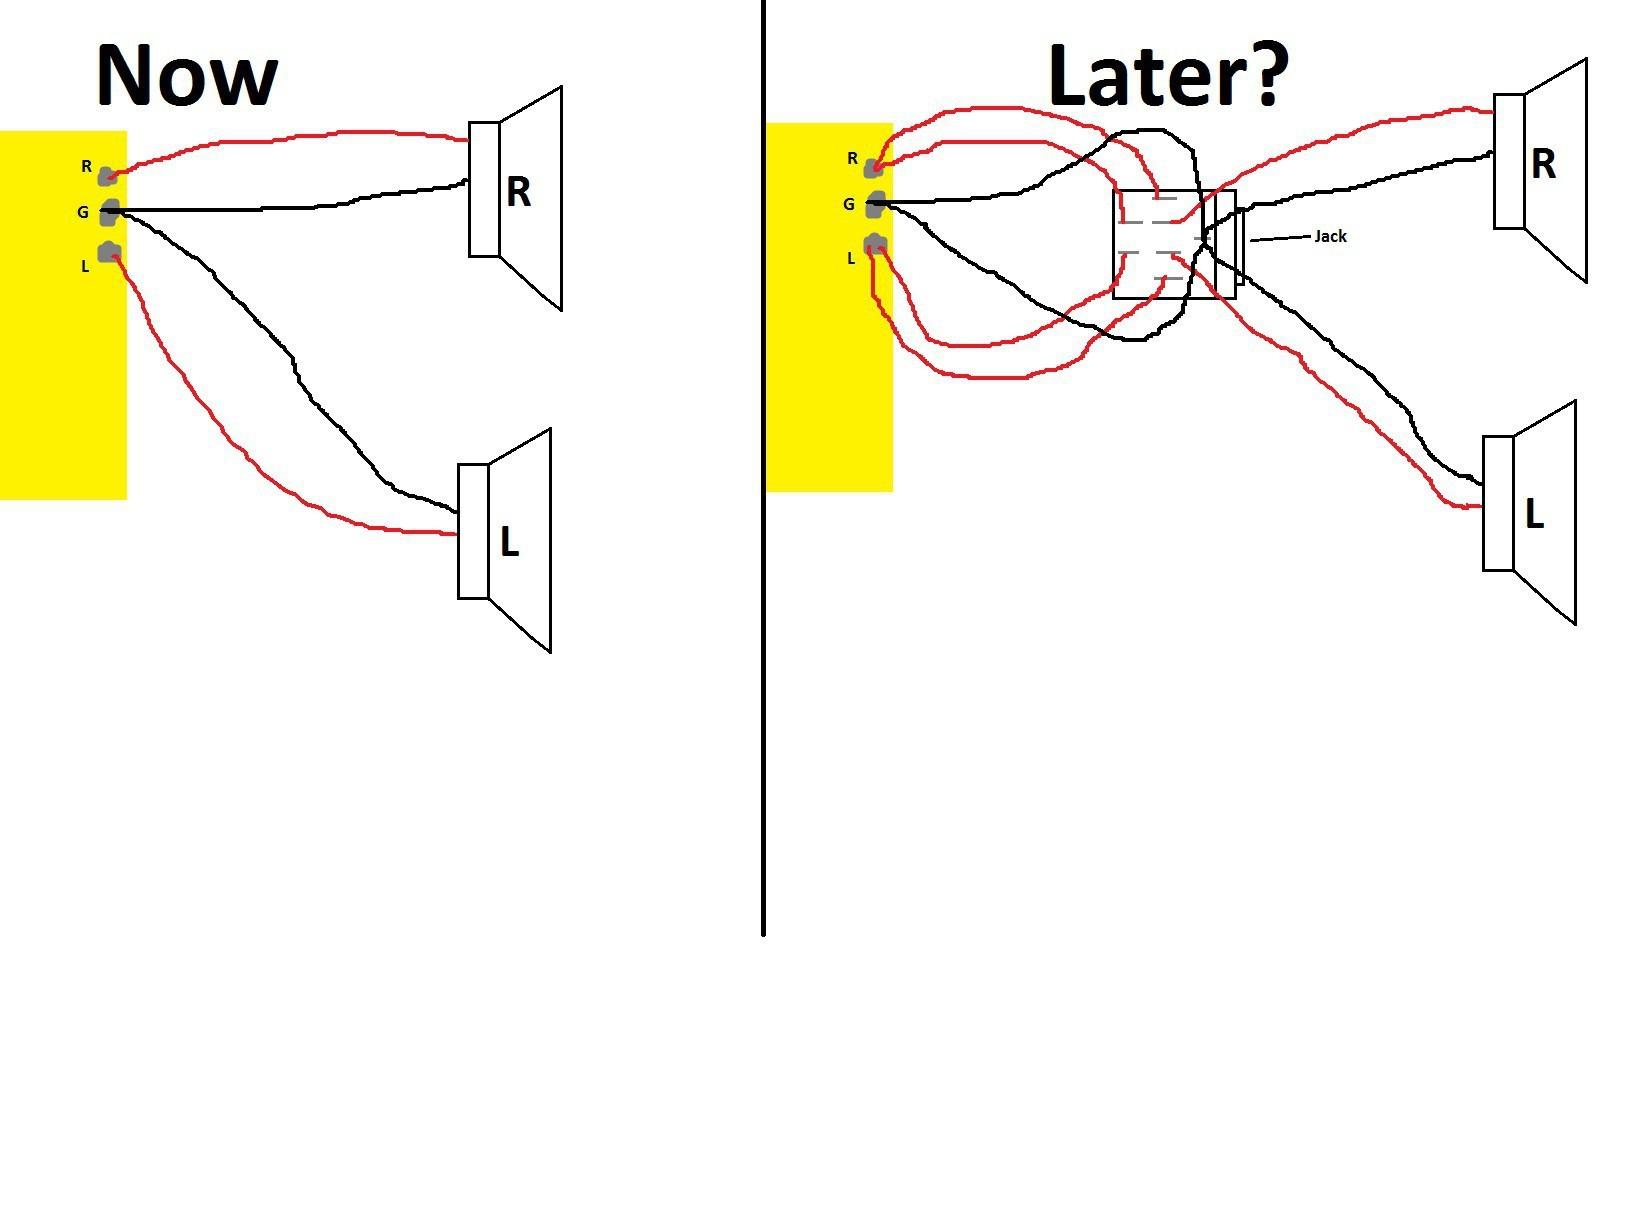 3 5 Mm Stereo Jack Wiring Diagram Beautiful 3 5 Mm Stereo Jack Wiring Diagram Inspirational Wiring